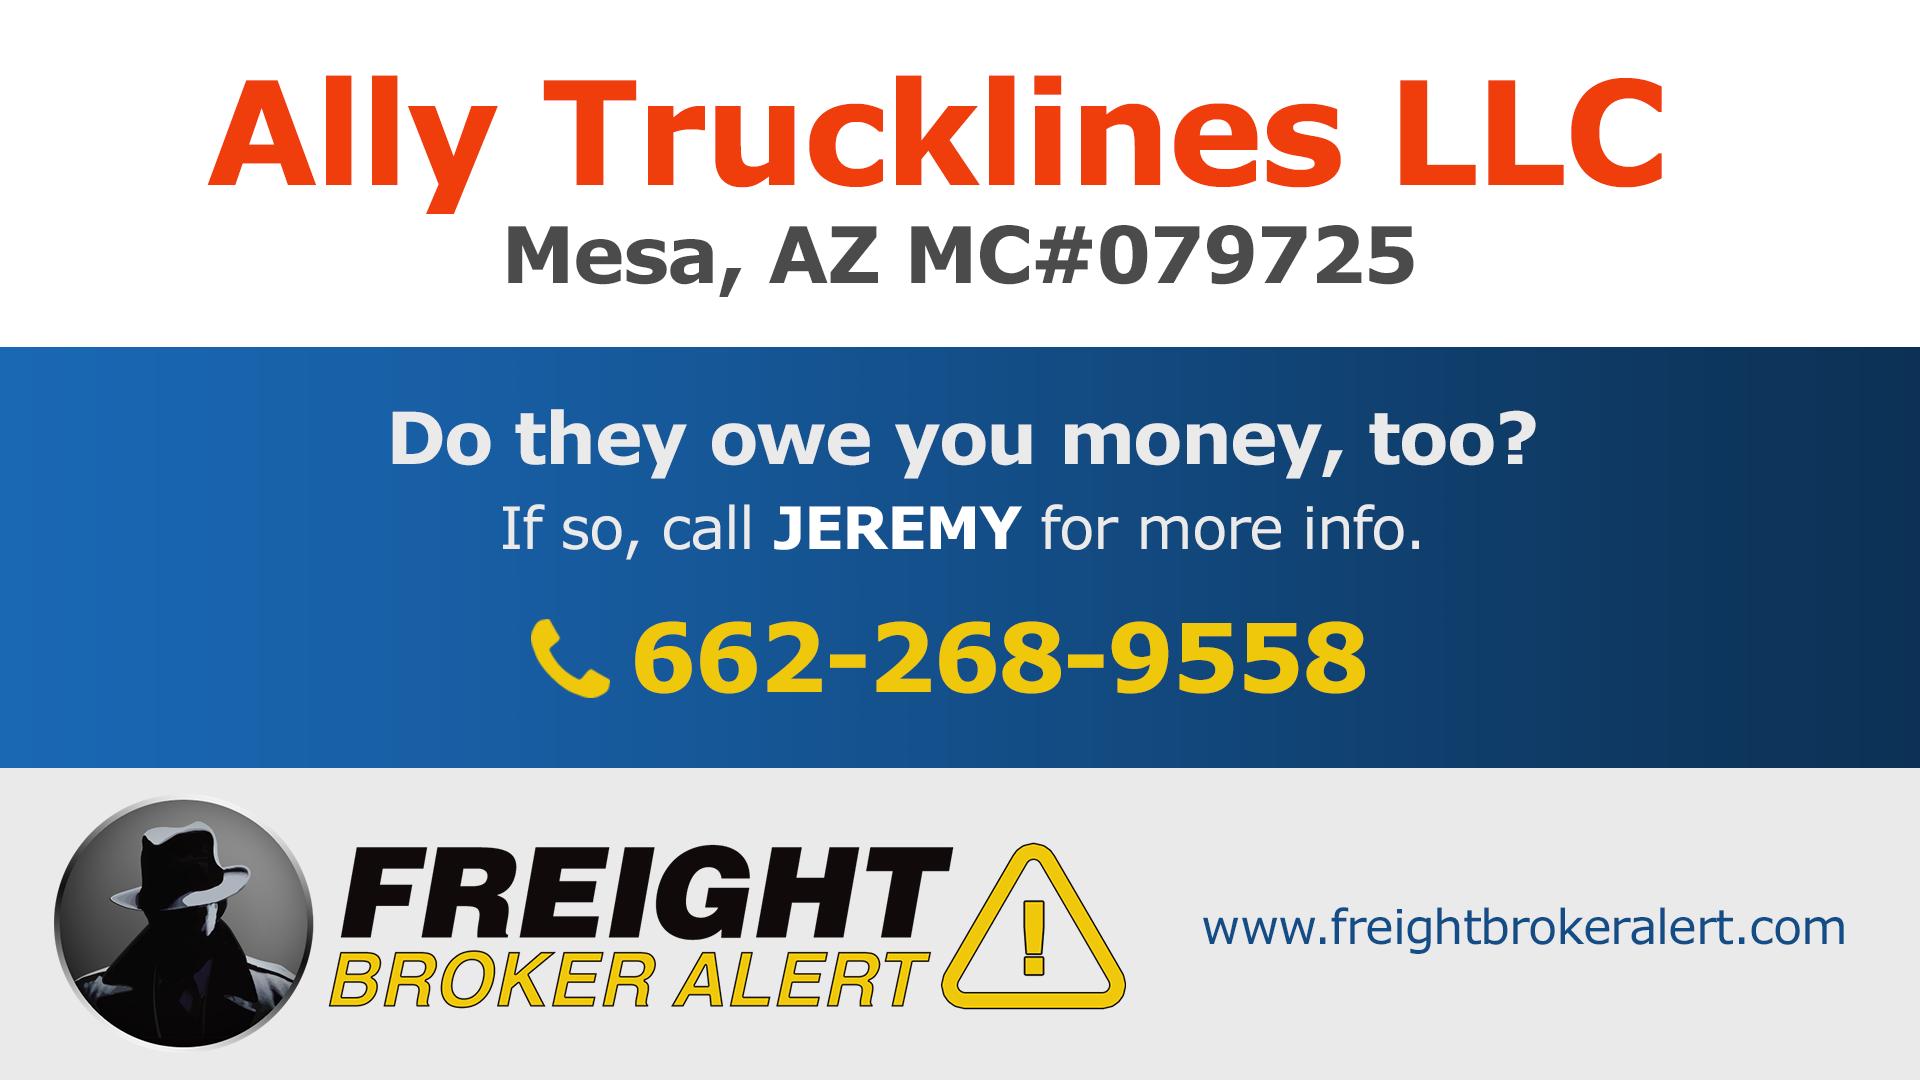 Ally Trucklines LLC Arizona